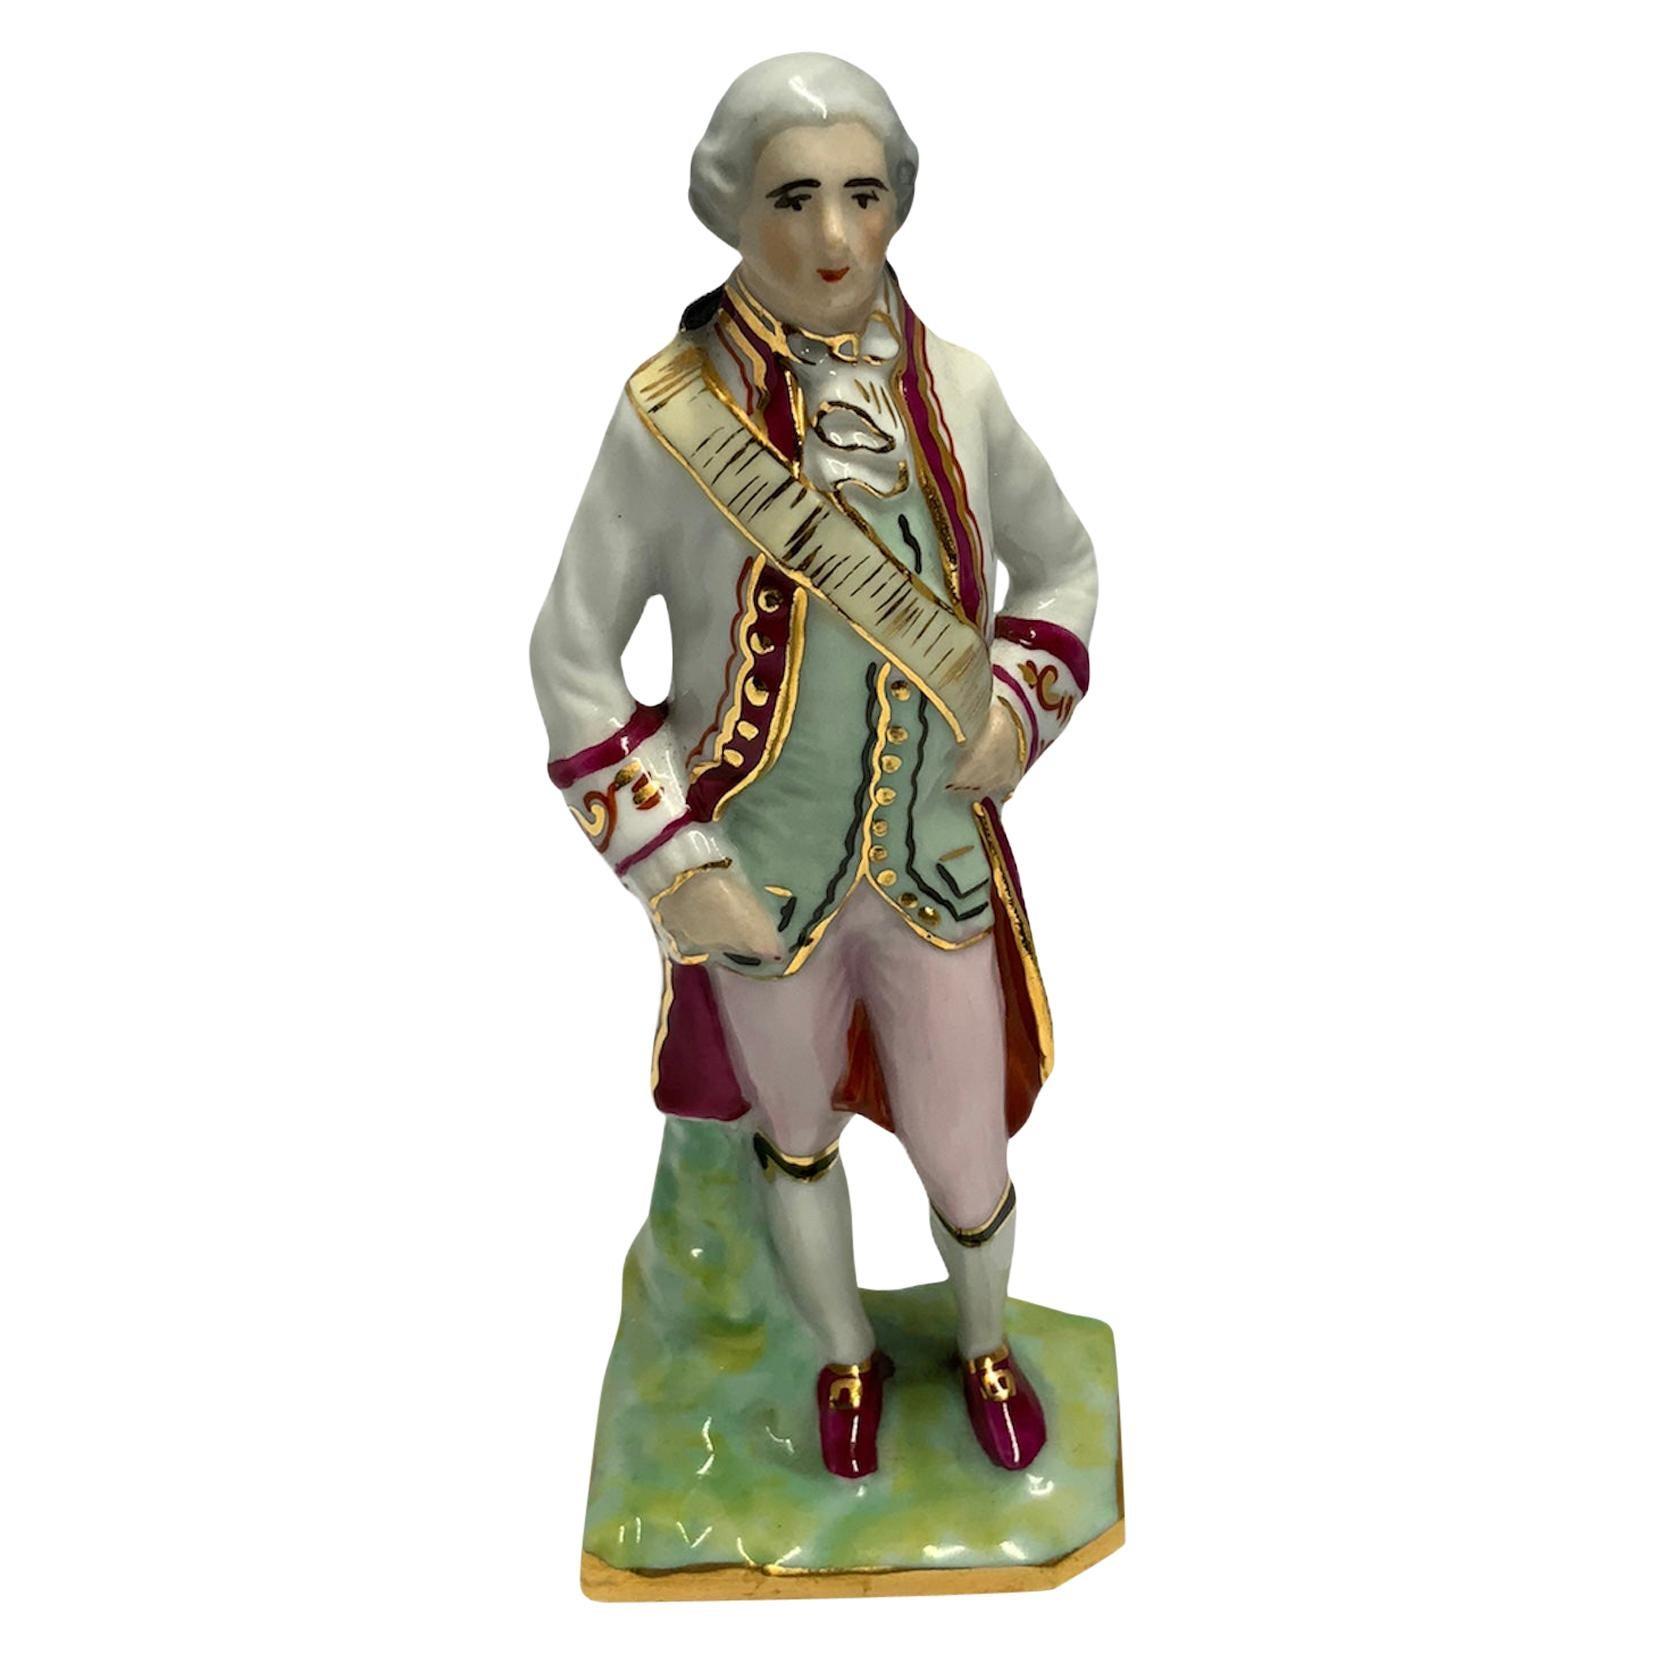 Limoges Porcelain Figurine of an 18th Century Gentleman